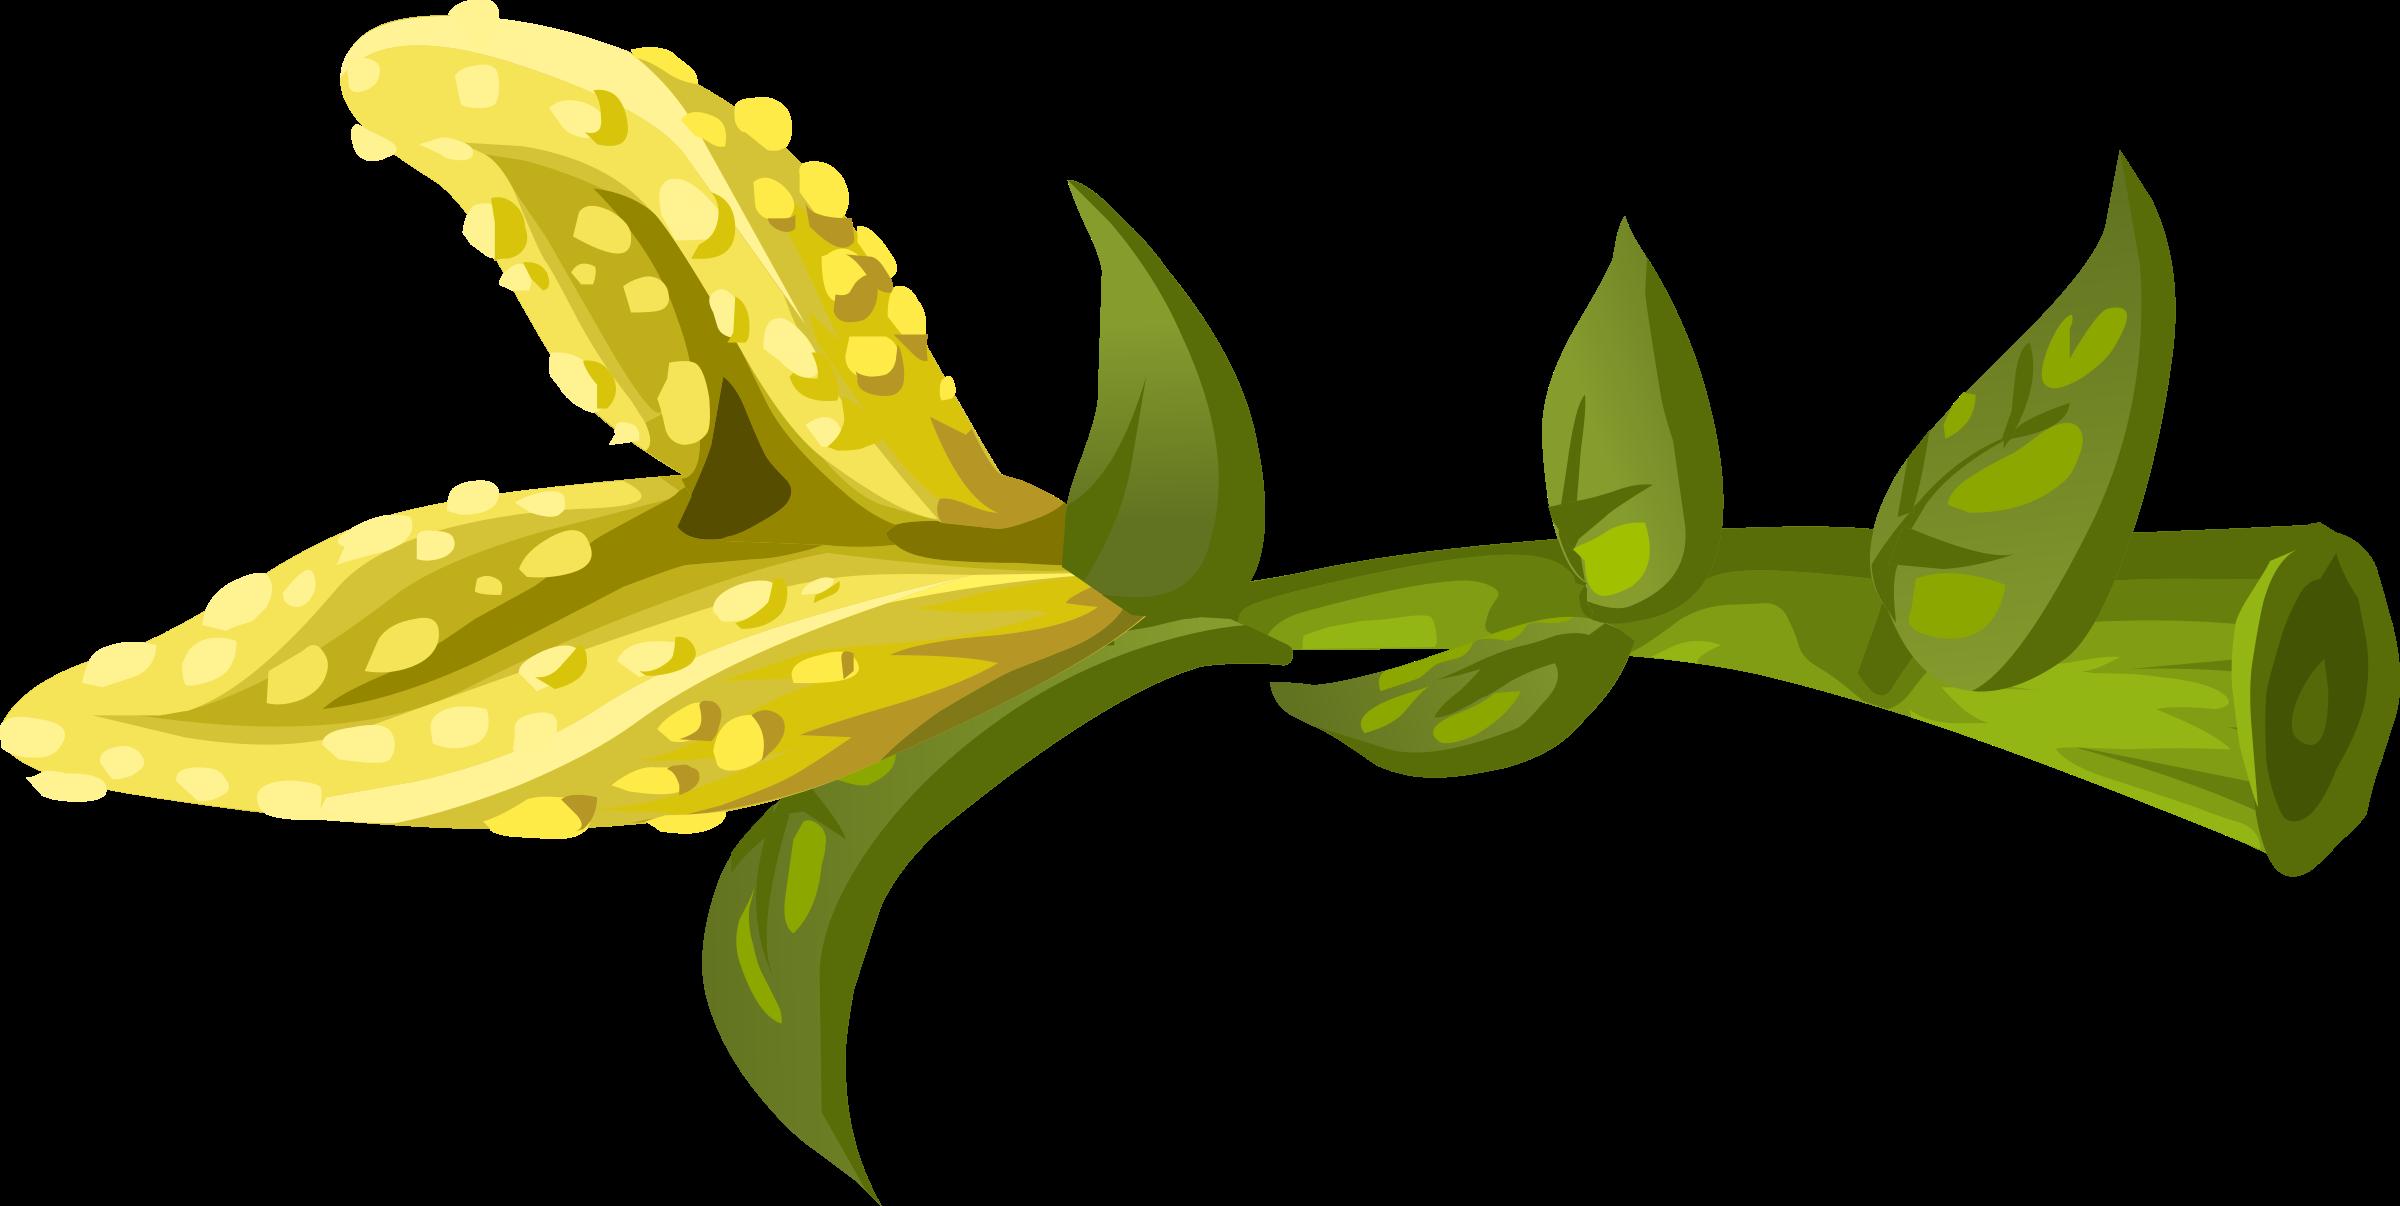 Glitch clipart flowery #3